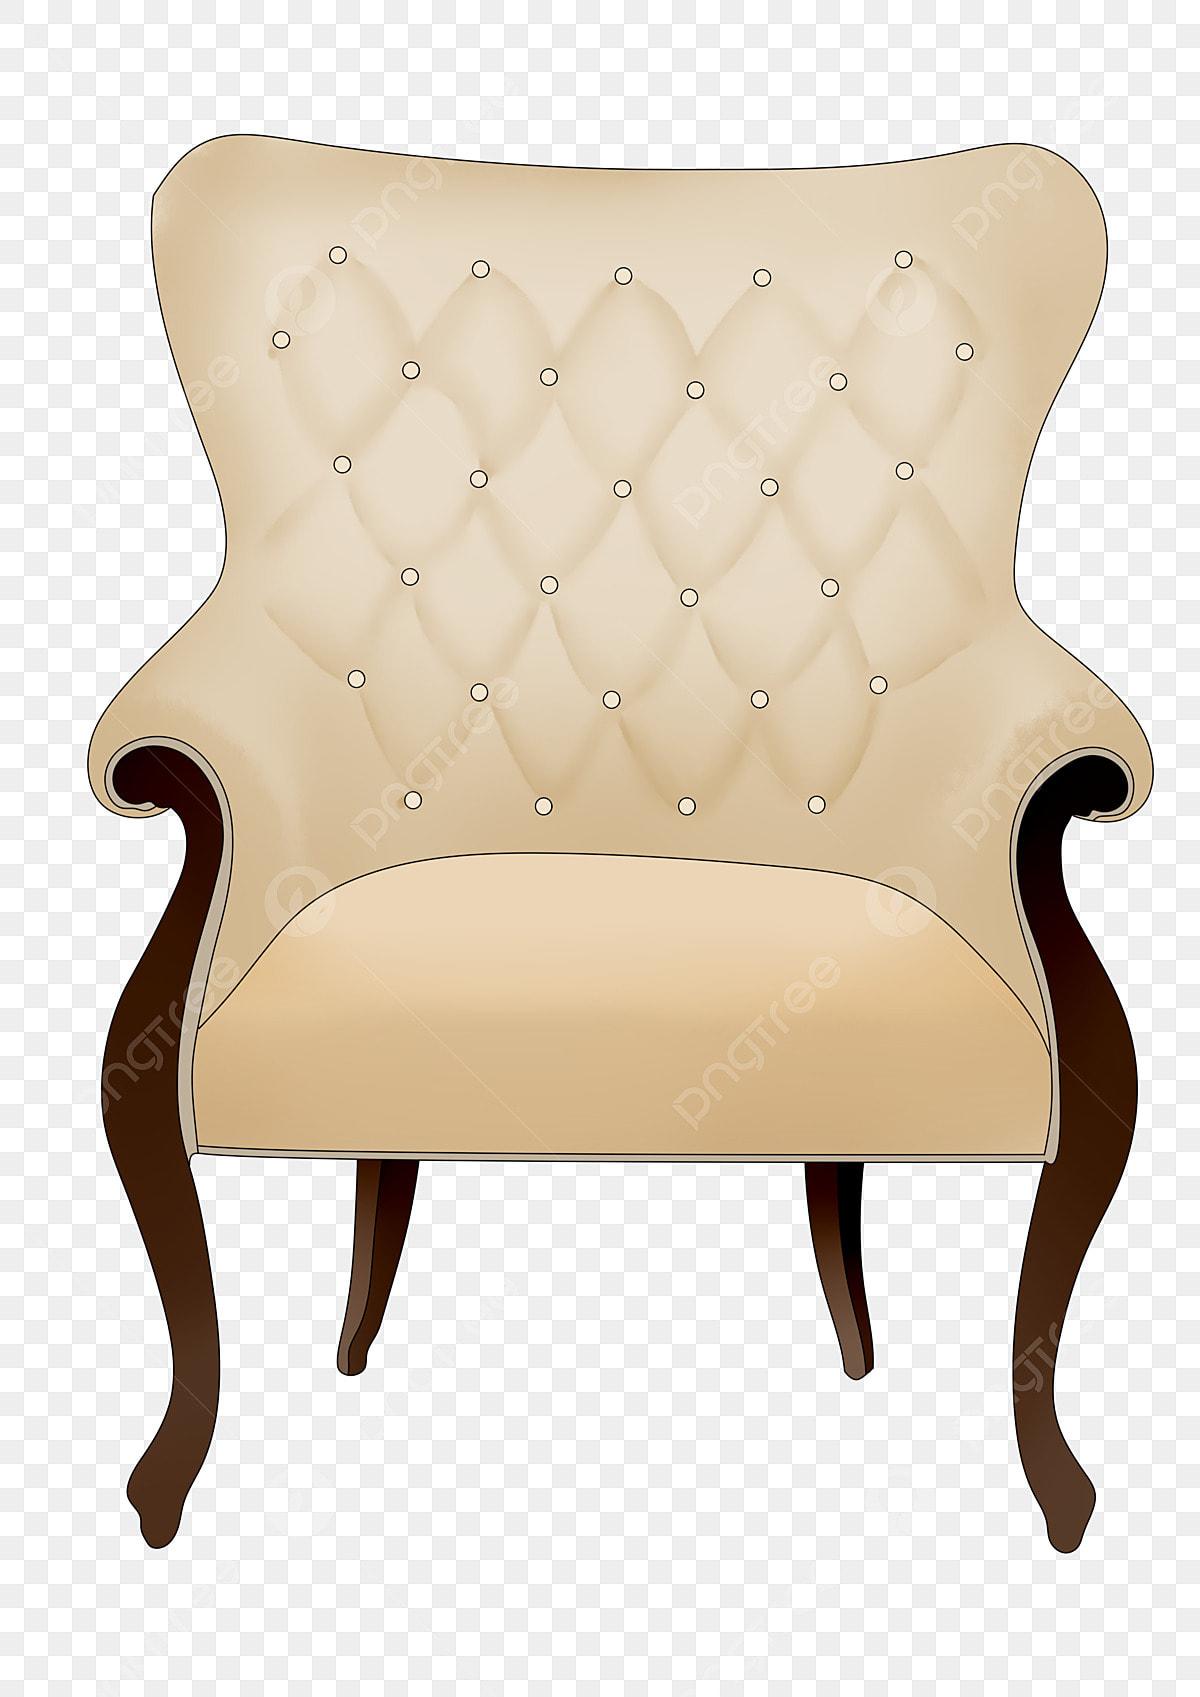 Wondrous European Single Sofa Illustration Single Sofa European Pabps2019 Chair Design Images Pabps2019Com